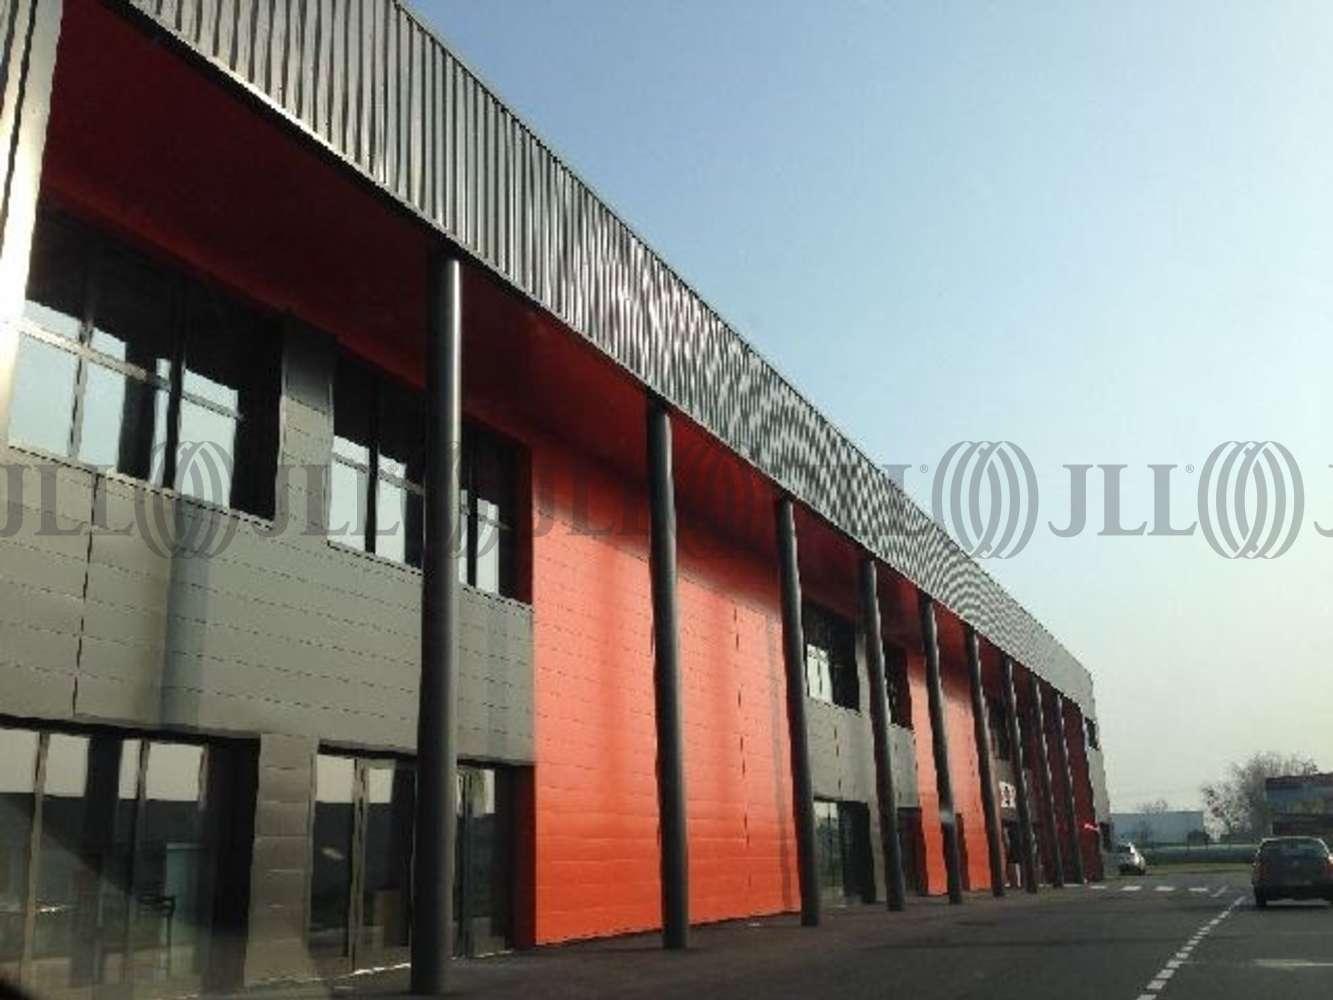 Activités/entrepôt Arnas, 69400 - Location locaux d'activité - Arnas (69) - 9453907